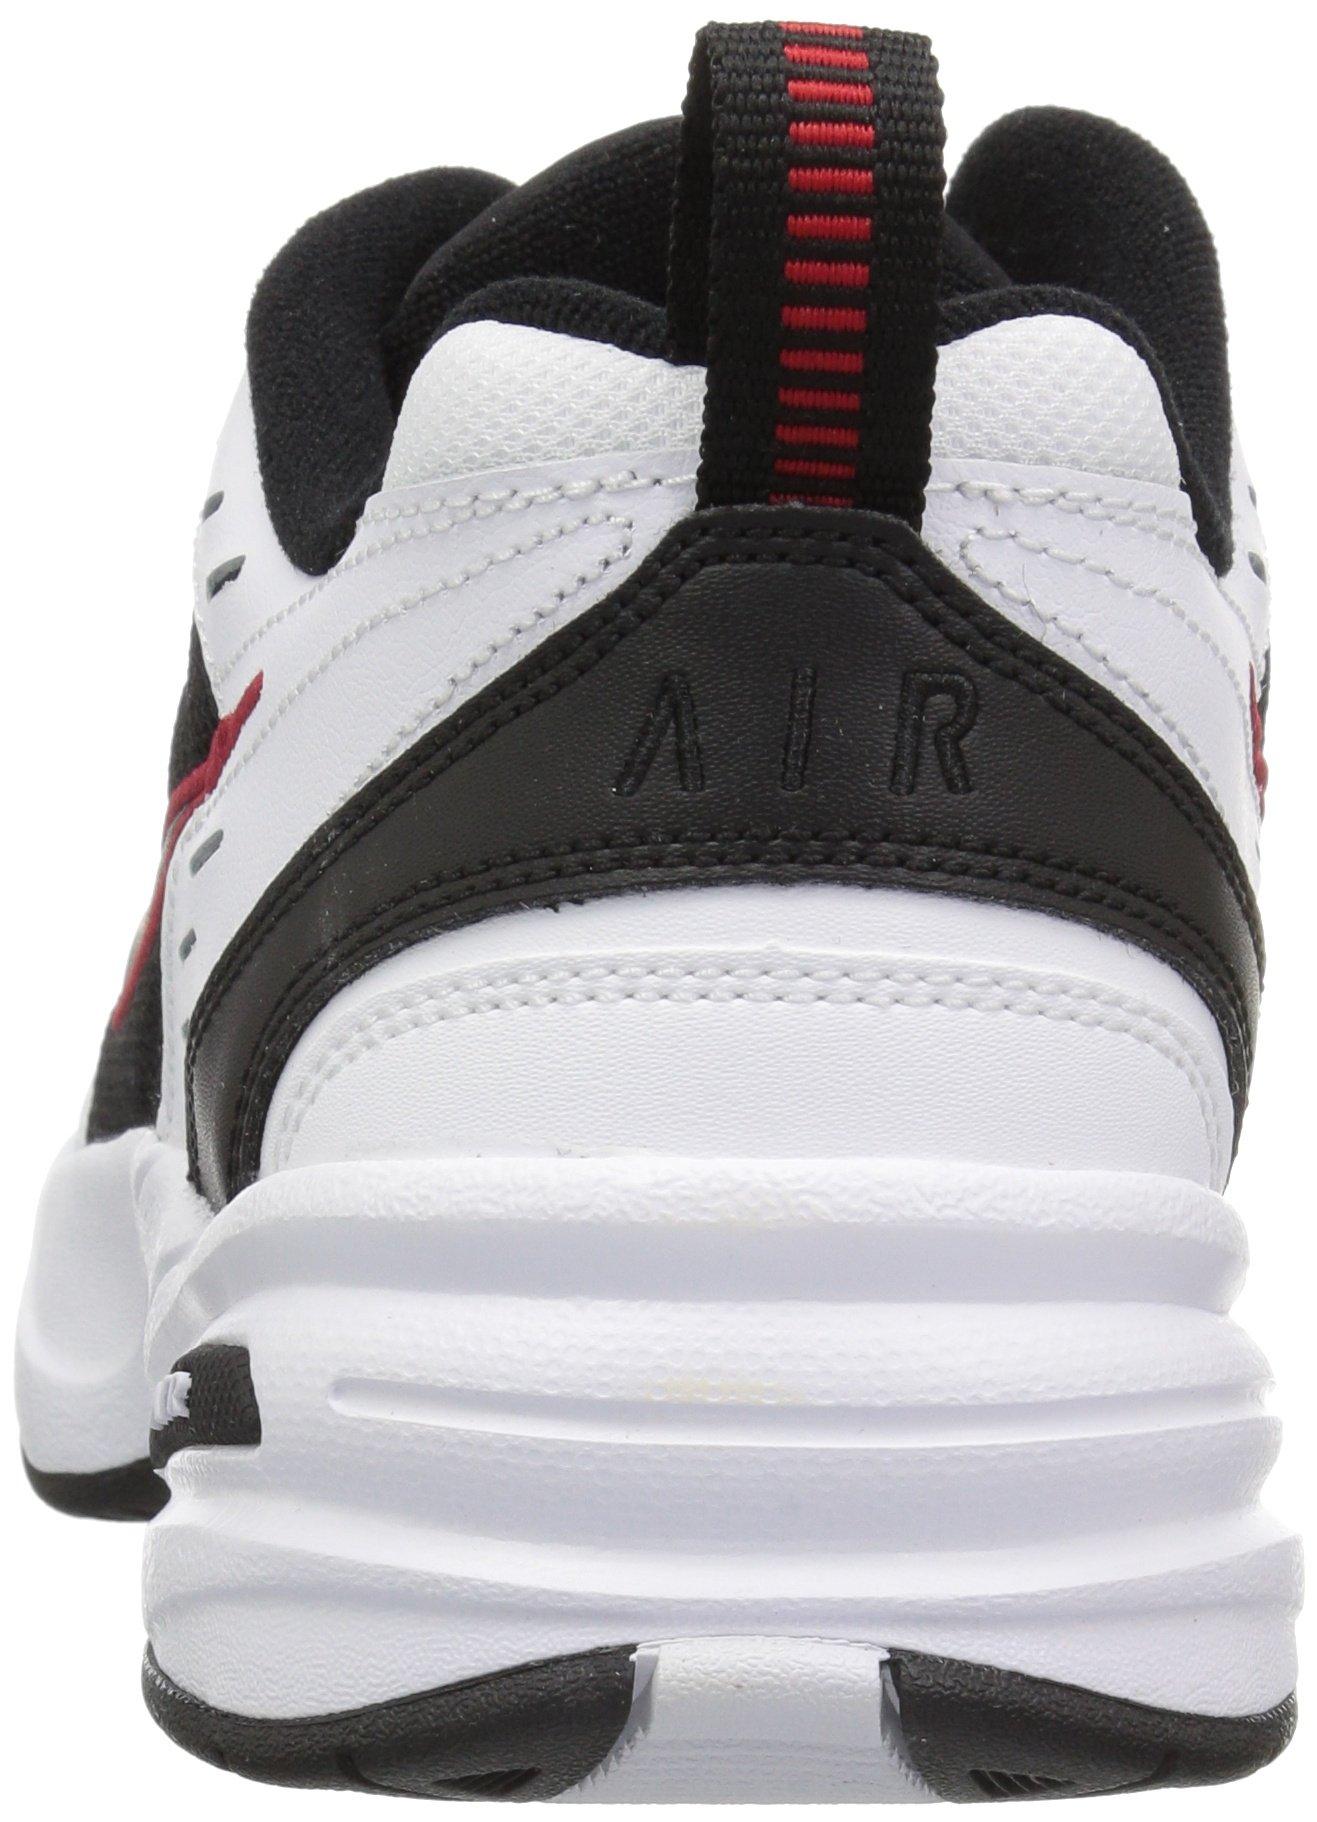 Nike-Men-039-s-Air-Monarch-IV-Cross-Trainer-Sneaker-416355 thumbnail 12